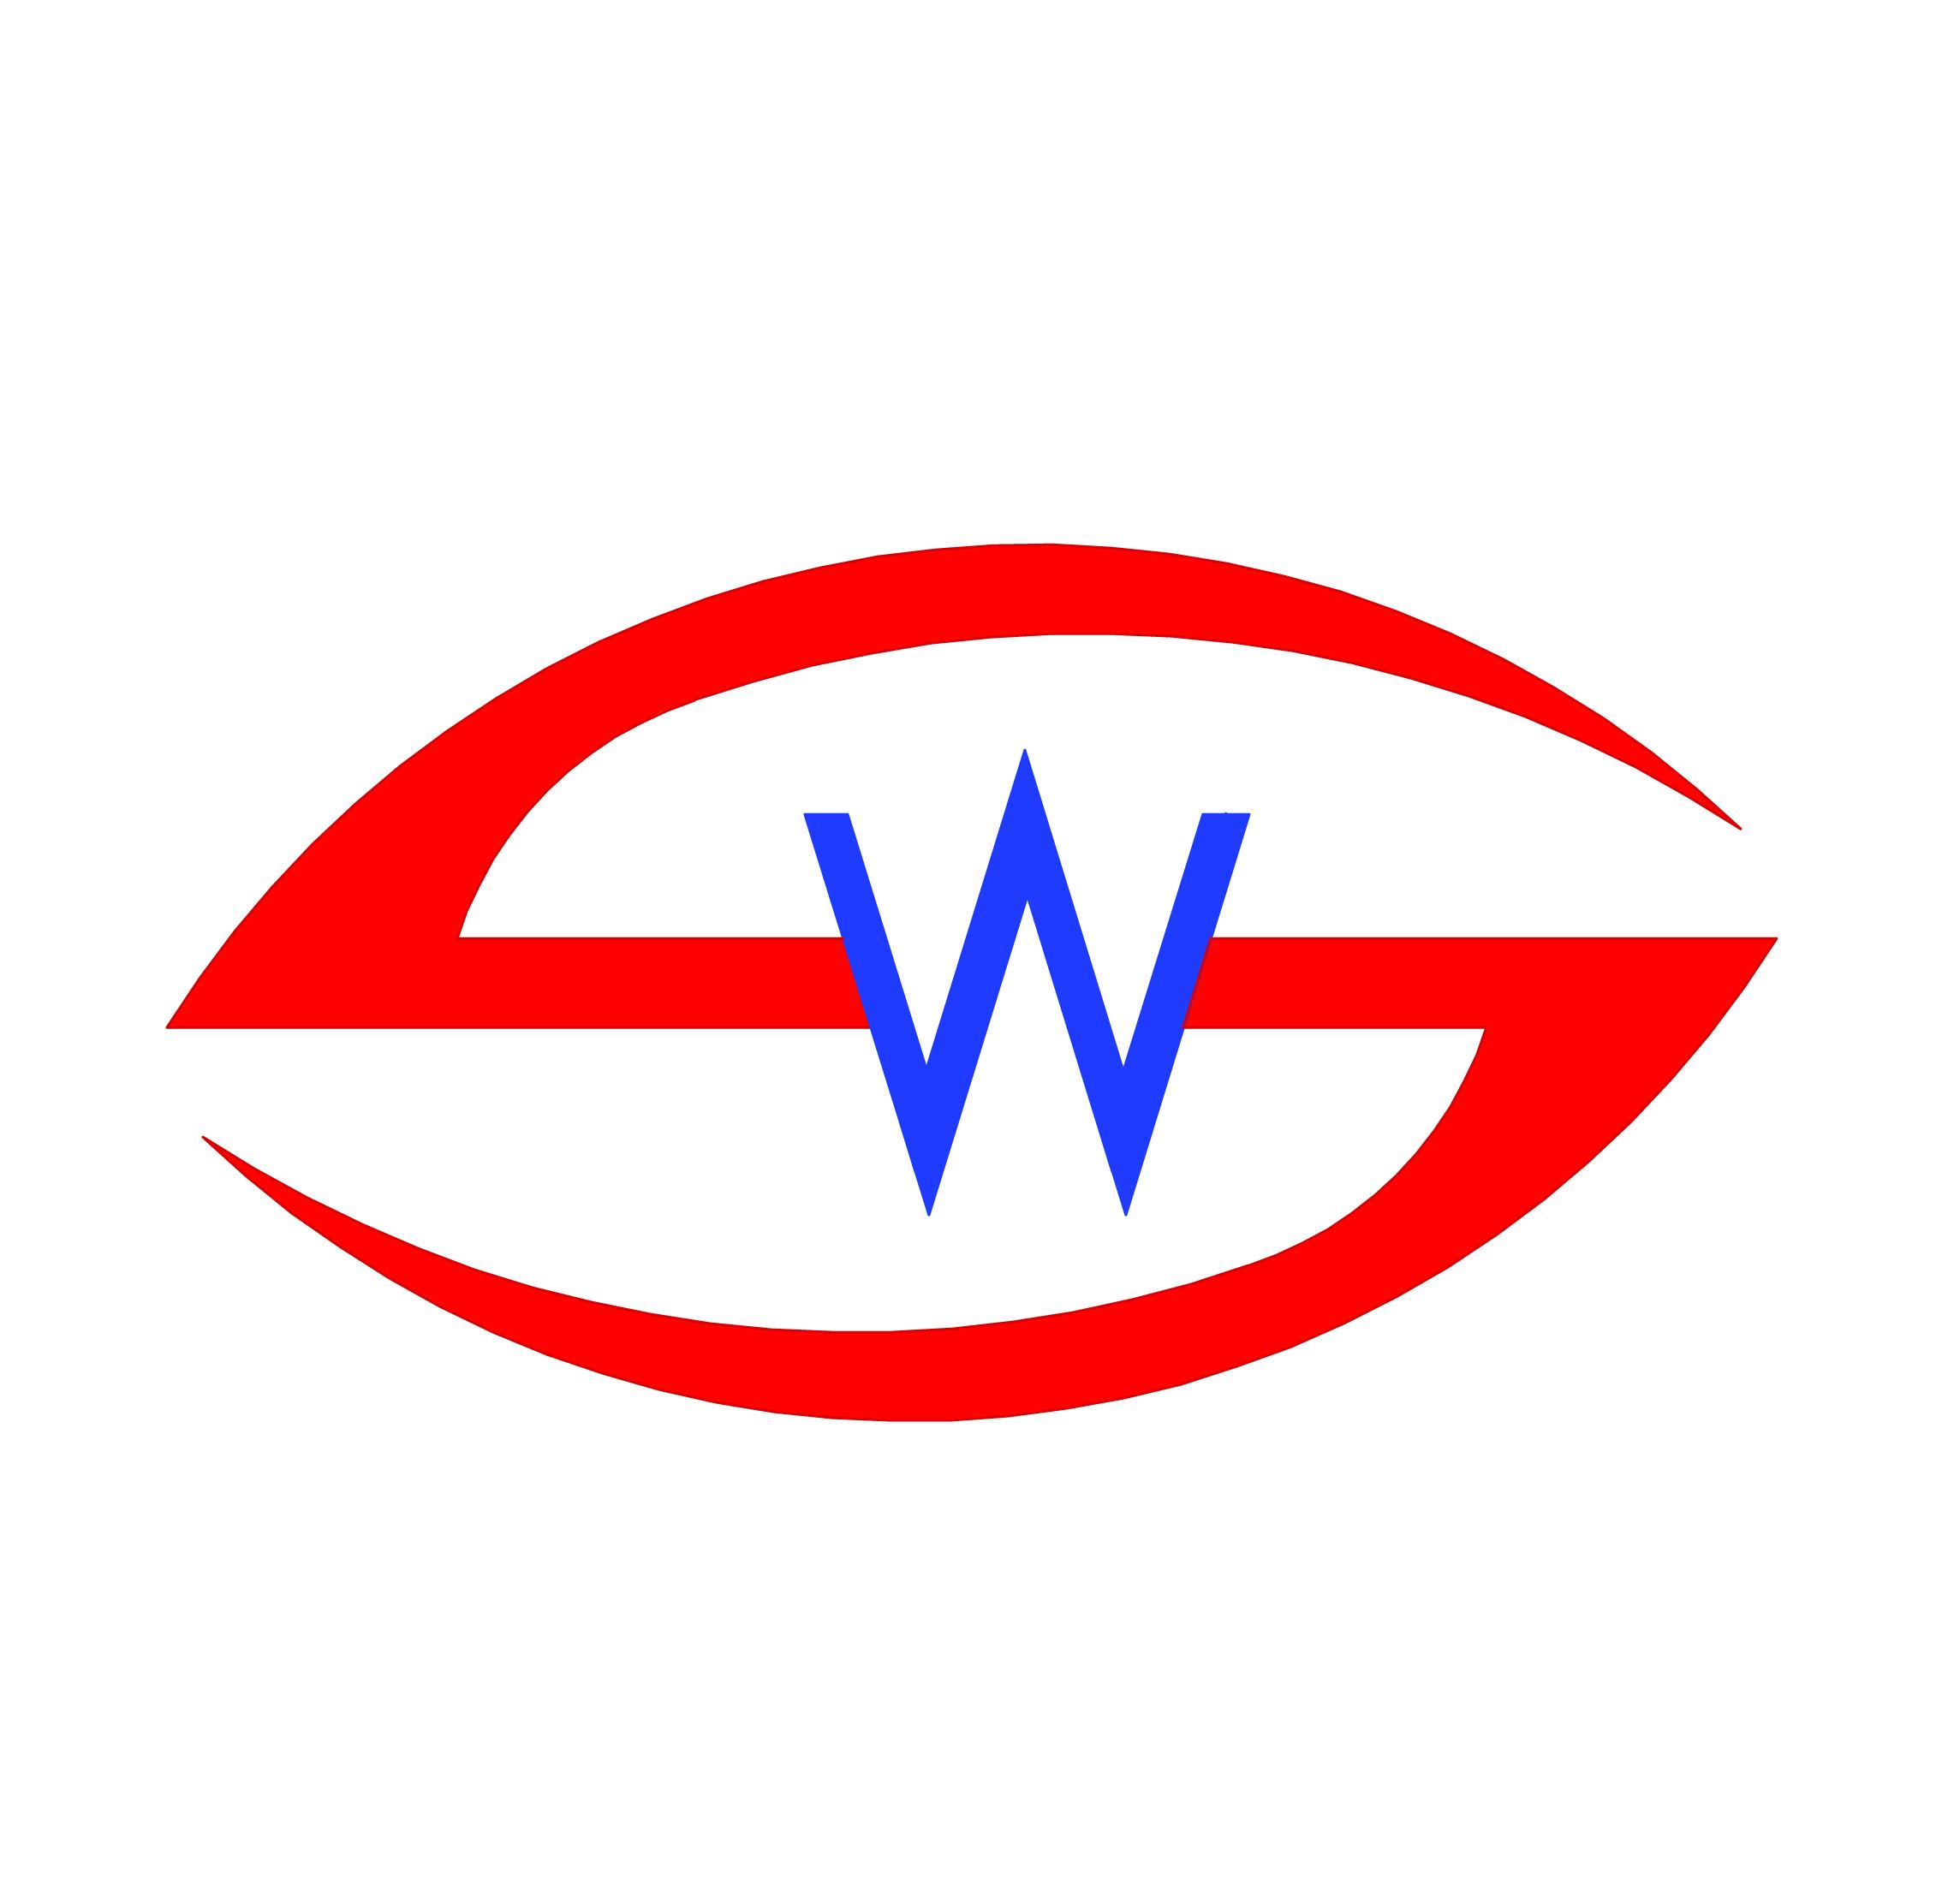 Microtunnellink partner: Swellwell Minechem P.L.